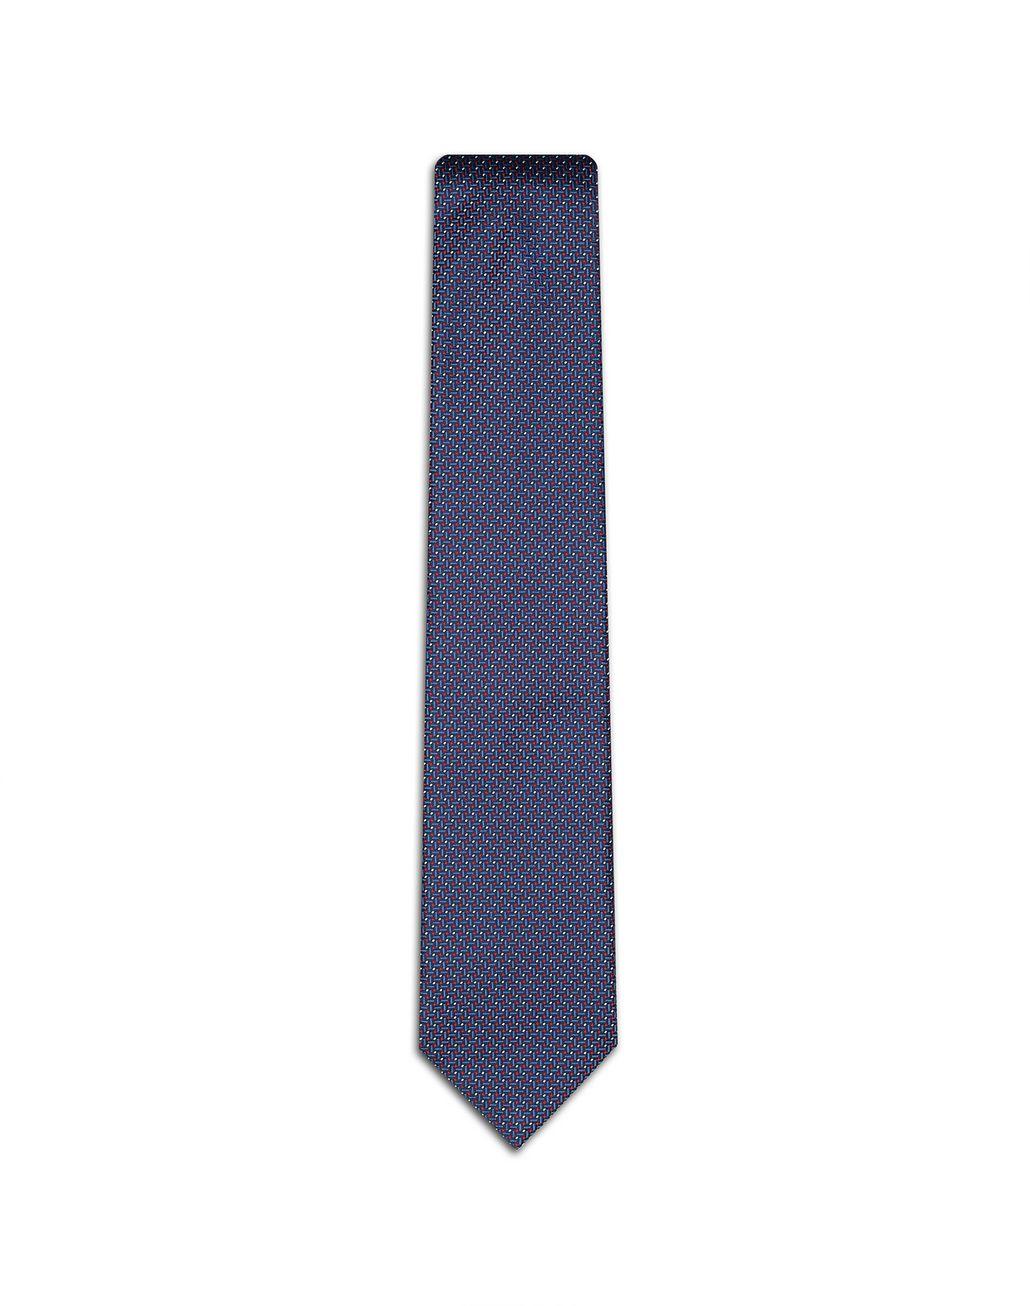 BRIONI Blue Micro Designed Tie. Tie Man f